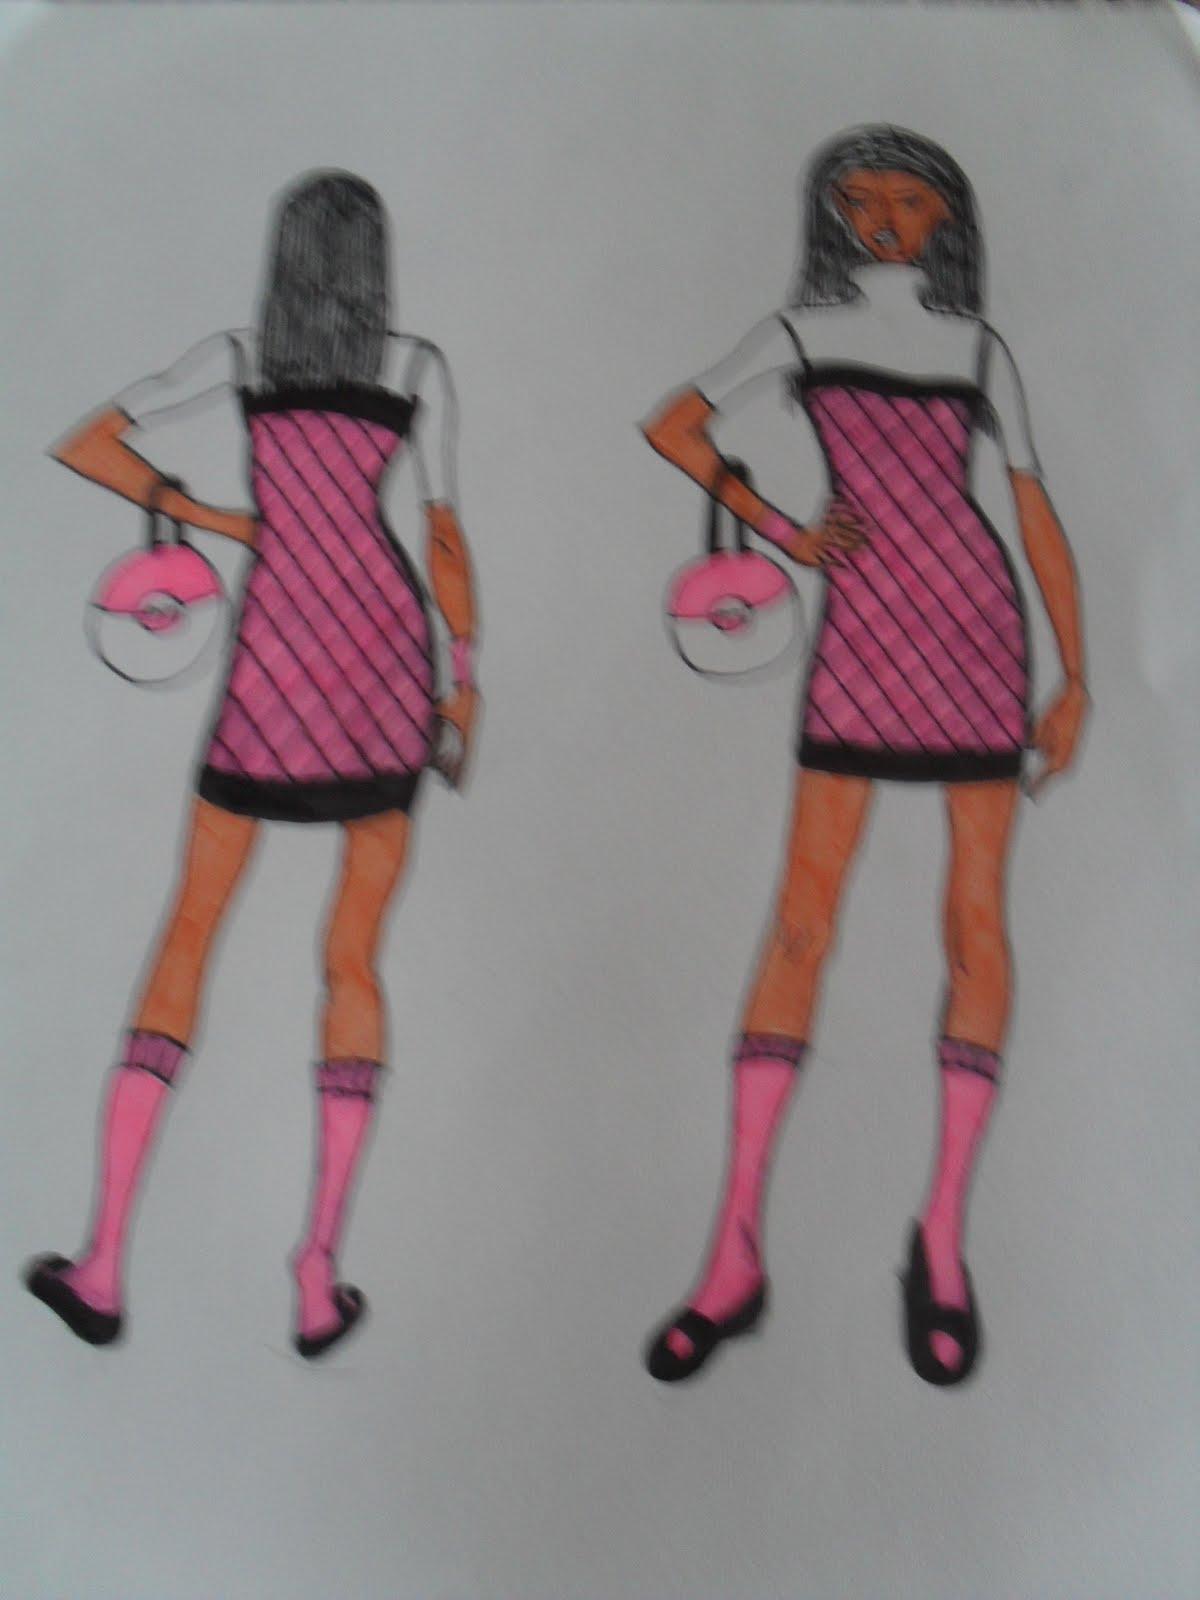 Vivian u0026#39;s Blog  Opdracht kleding ontwerpen